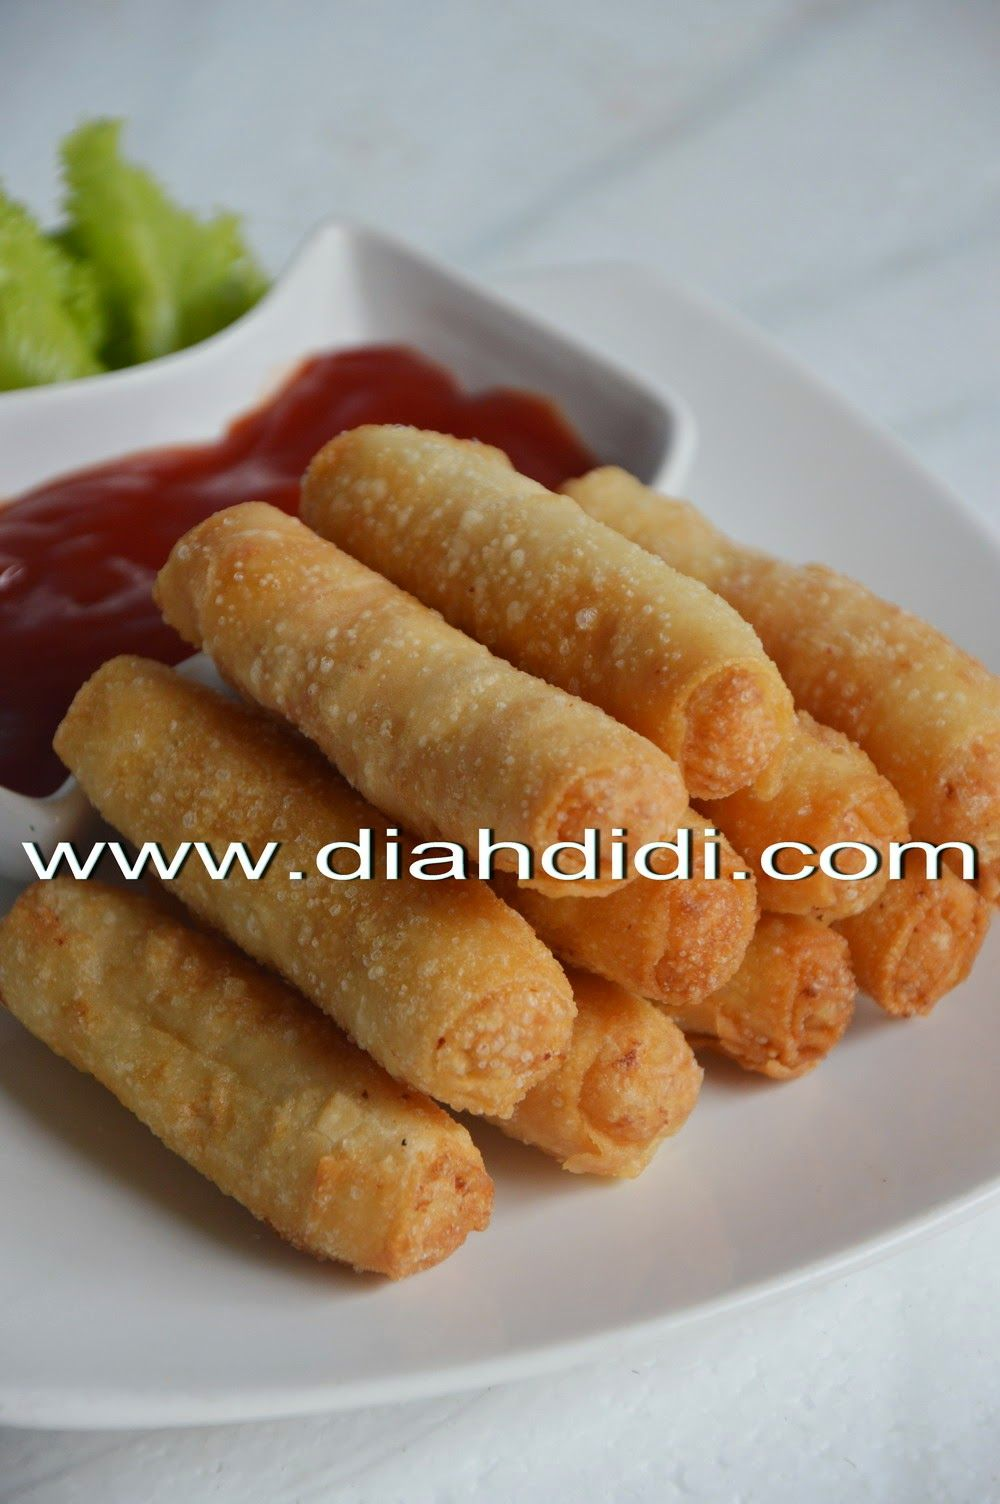 Diah Didi S Kitchen Pangsit Udang Gulung Resep Masakan Ide Makanan Resep